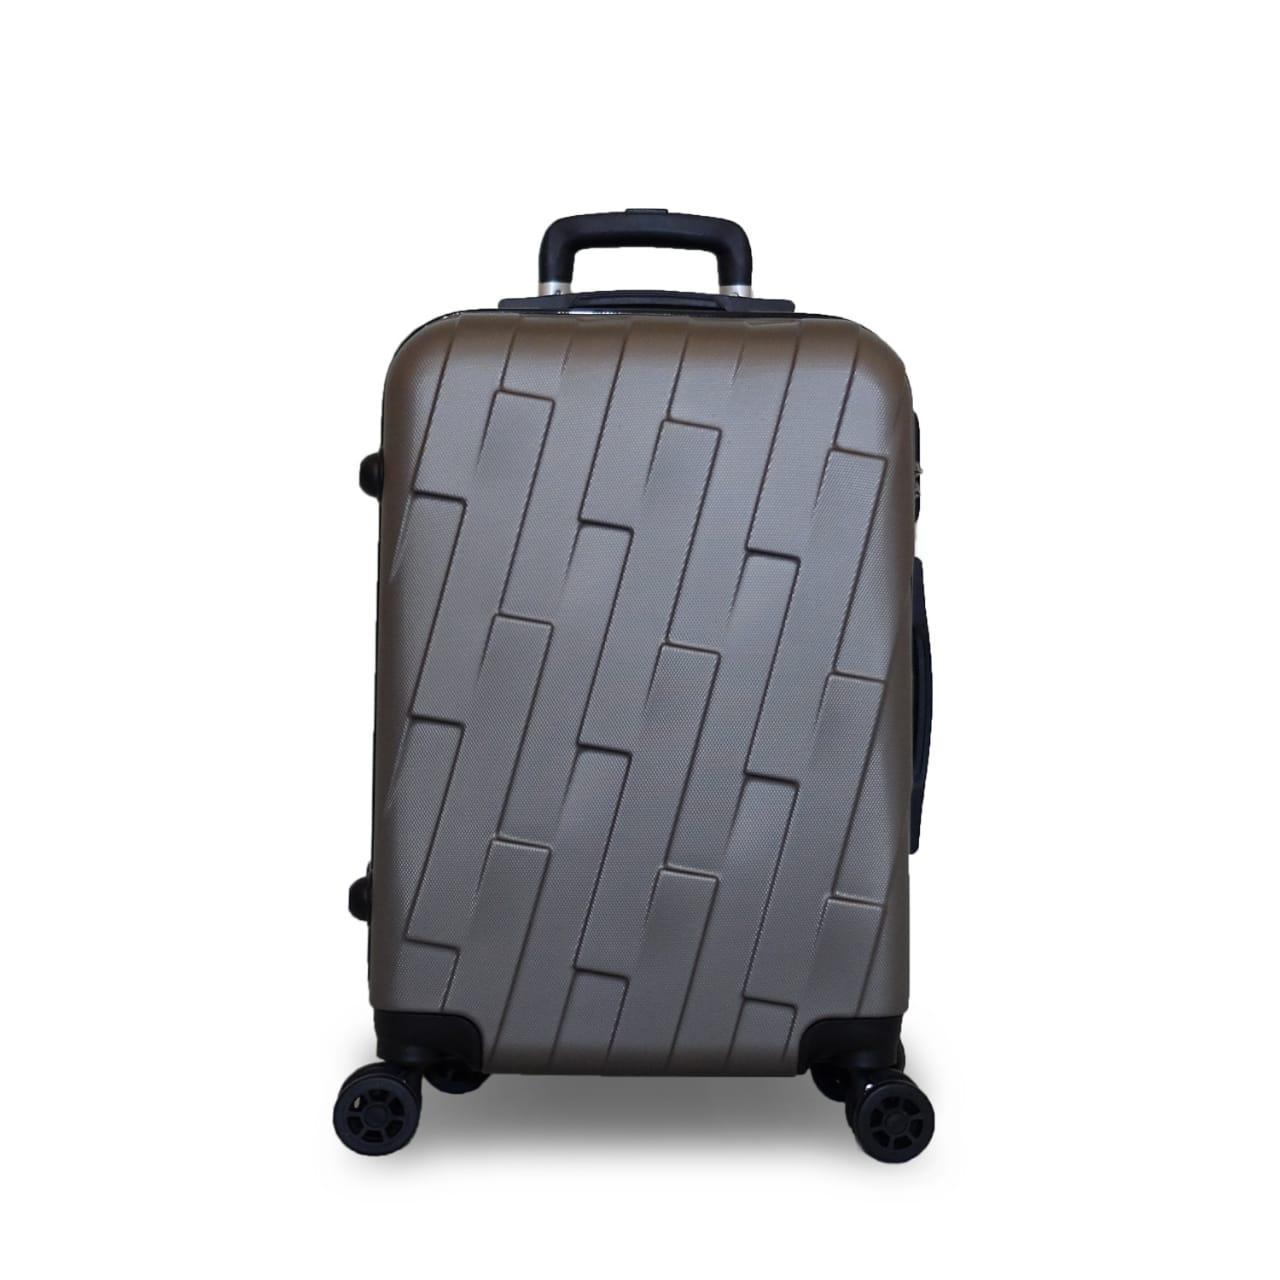 ... Koper Polo UVO Hardcase Luggage 21 Inchi 804-20 Silver Waterproof - 3 ...